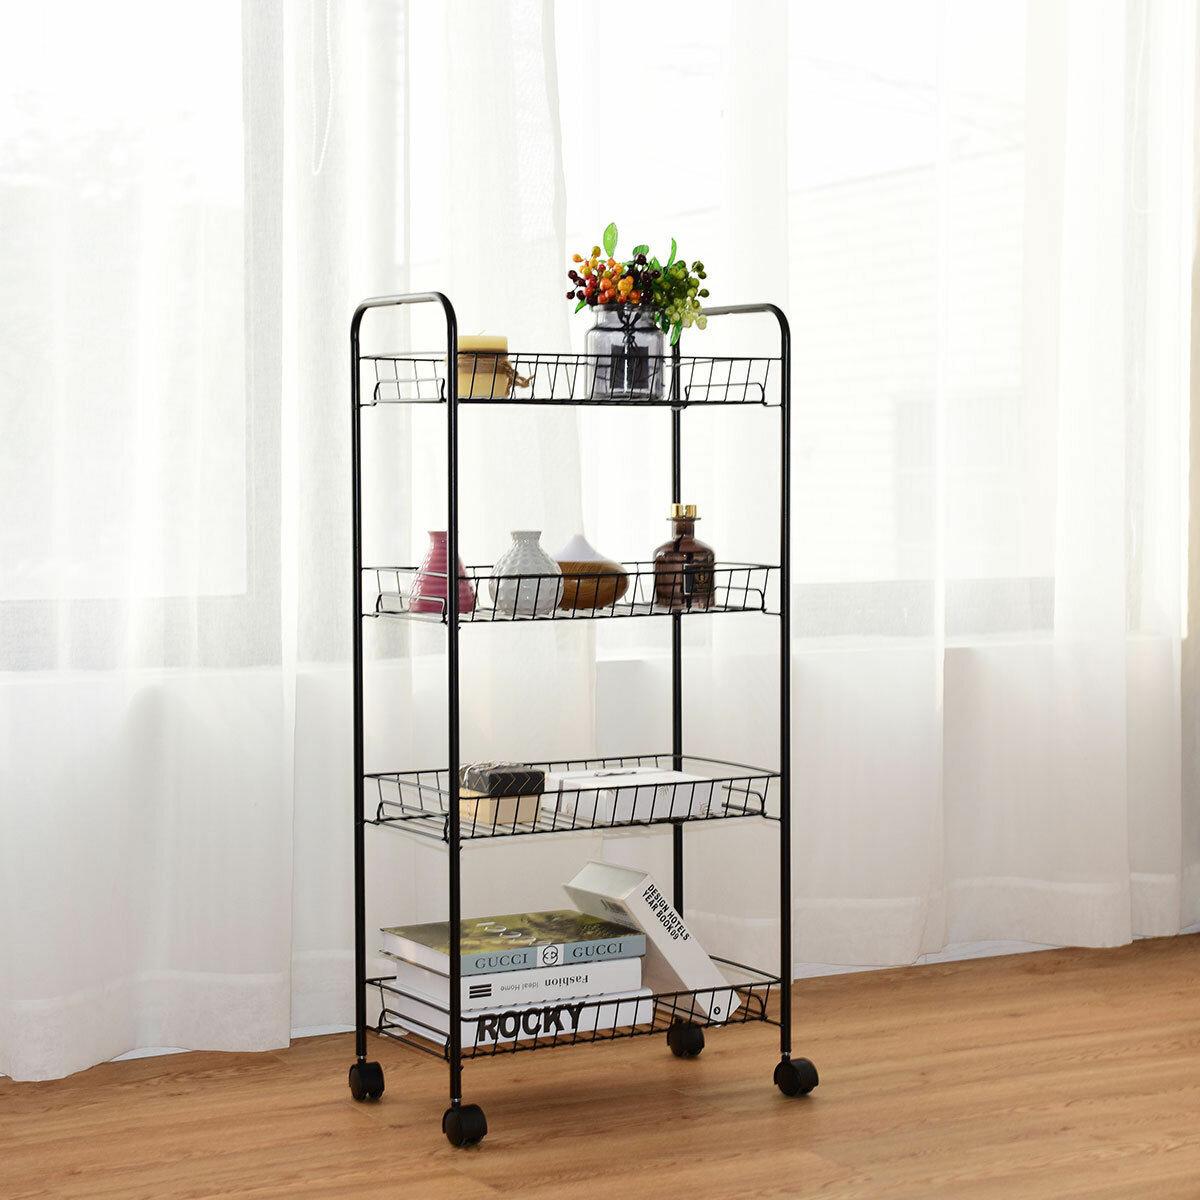 4 Tier Rolling Wheels Tower Rack Baskets Kitchen Bathroom Utility Cart